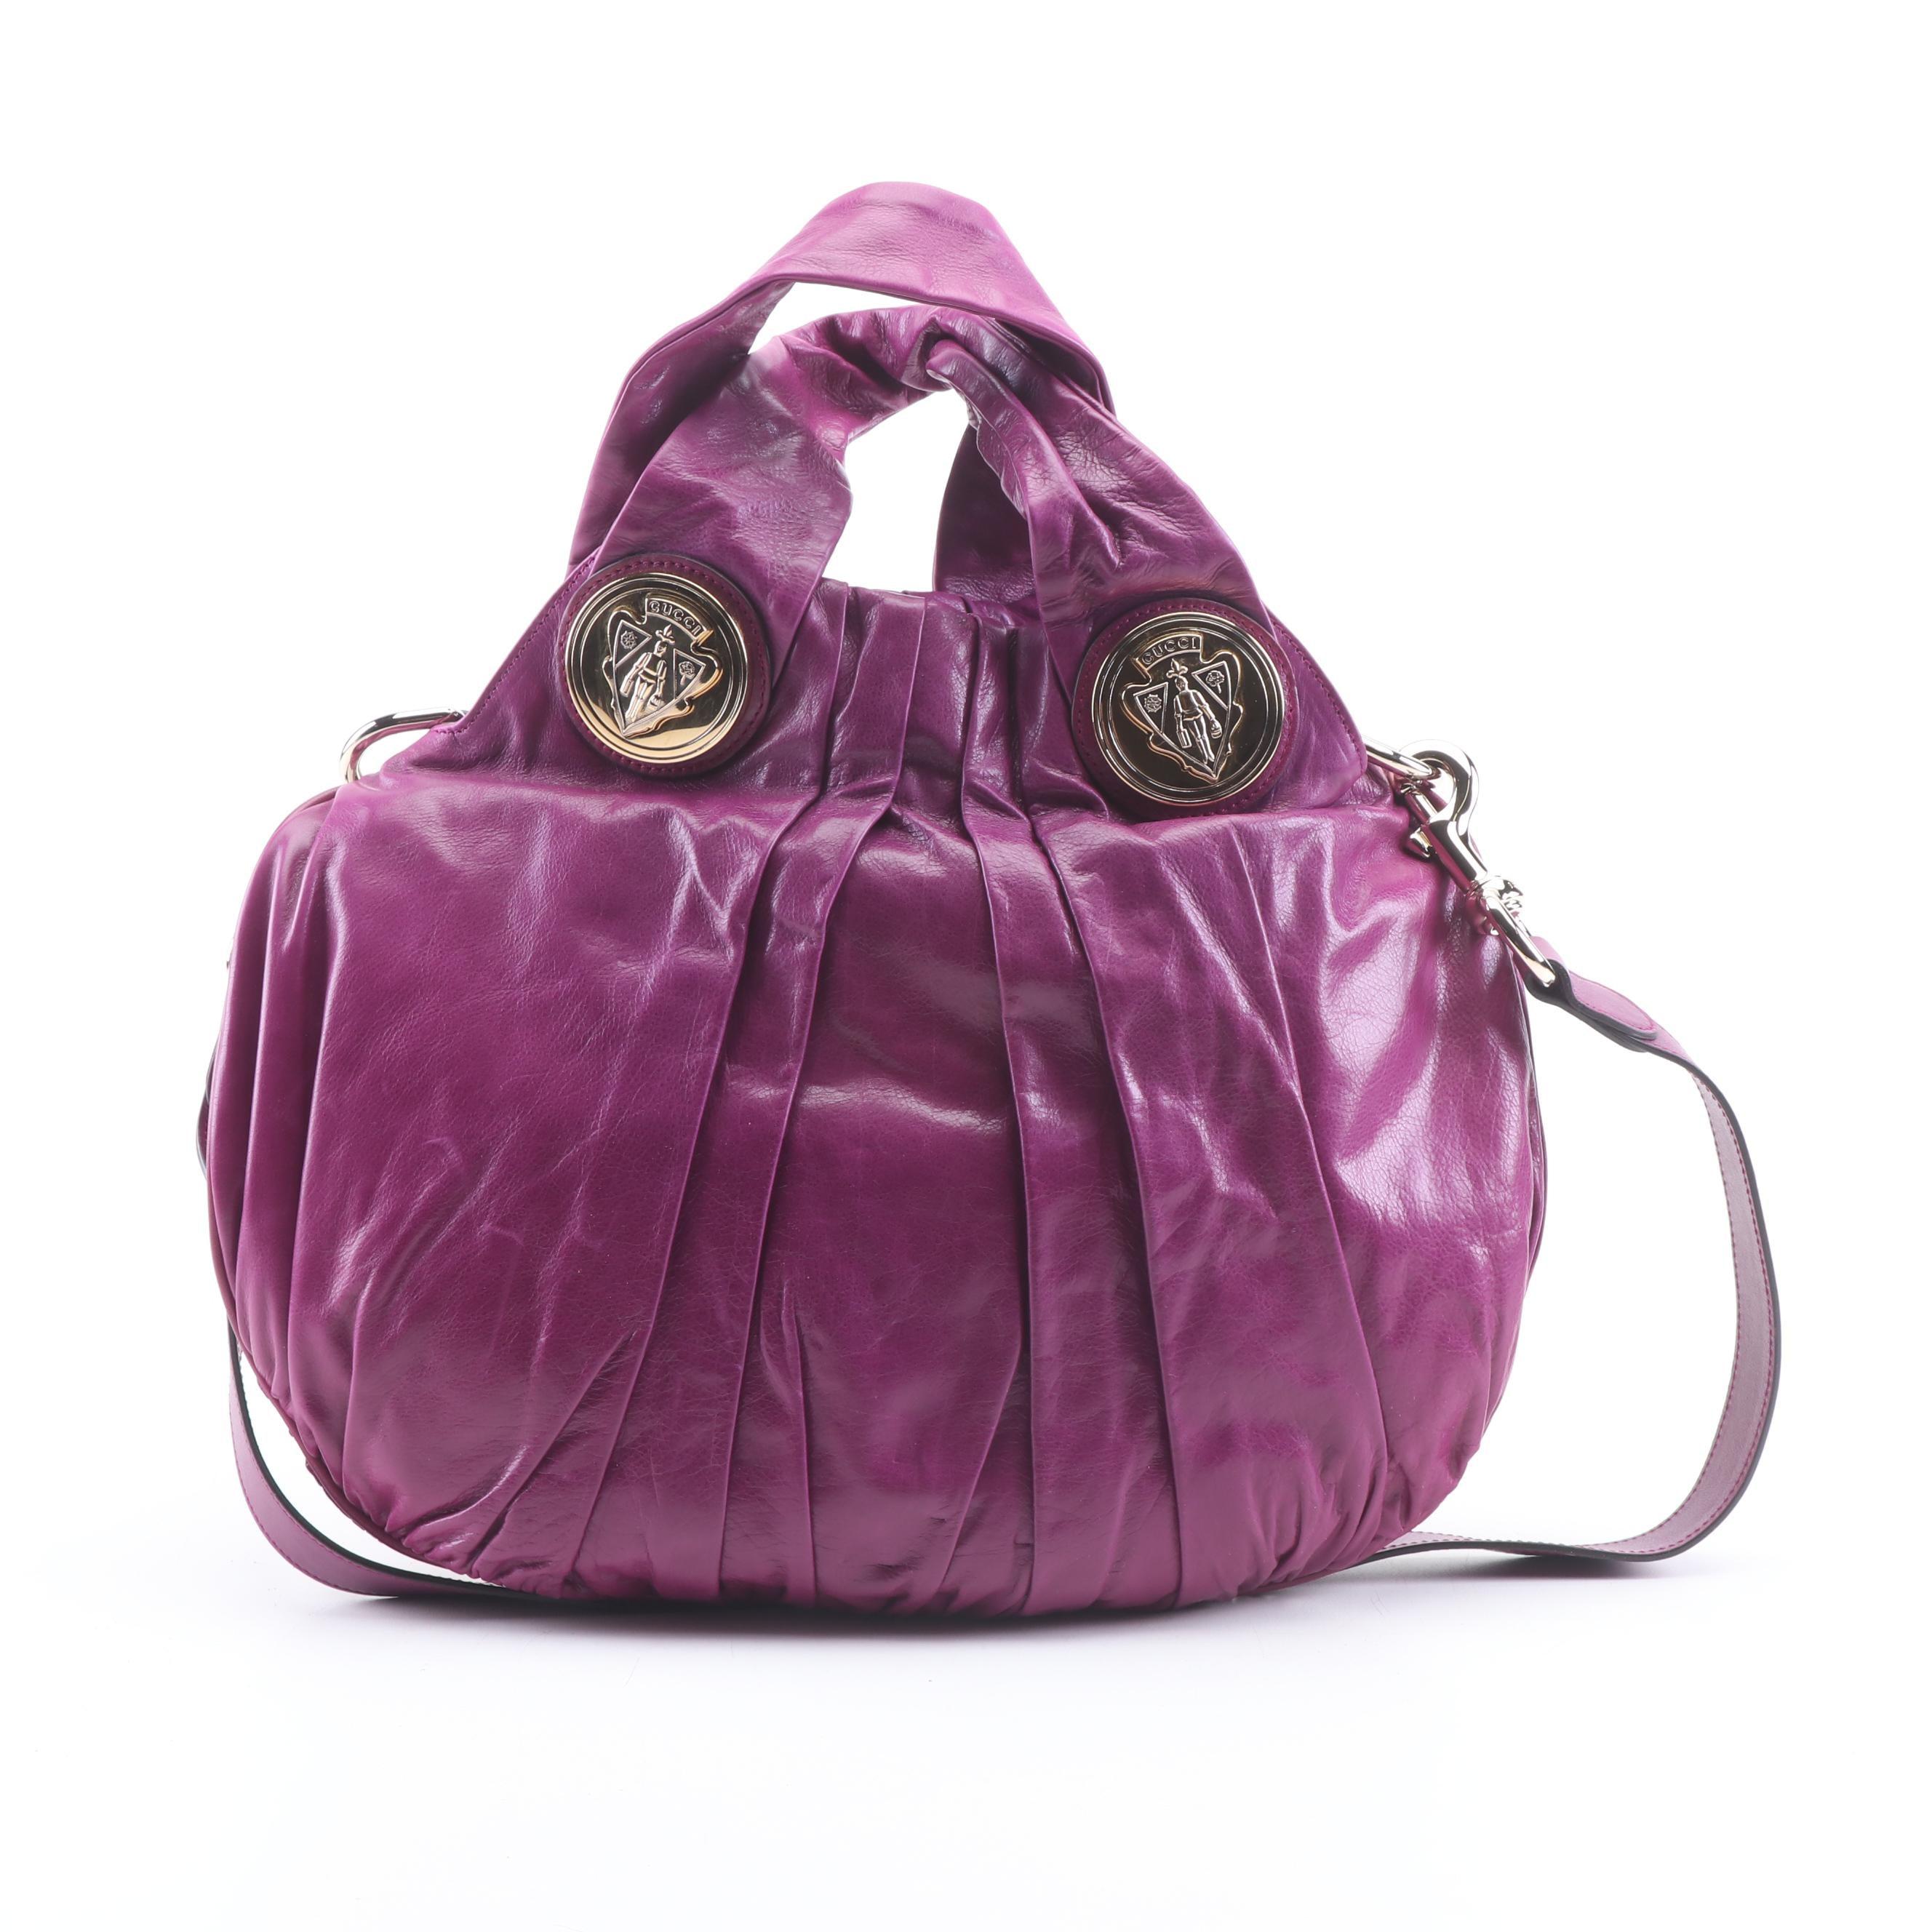 Gucci Magenta Leather Hysteria Shoulder Bag